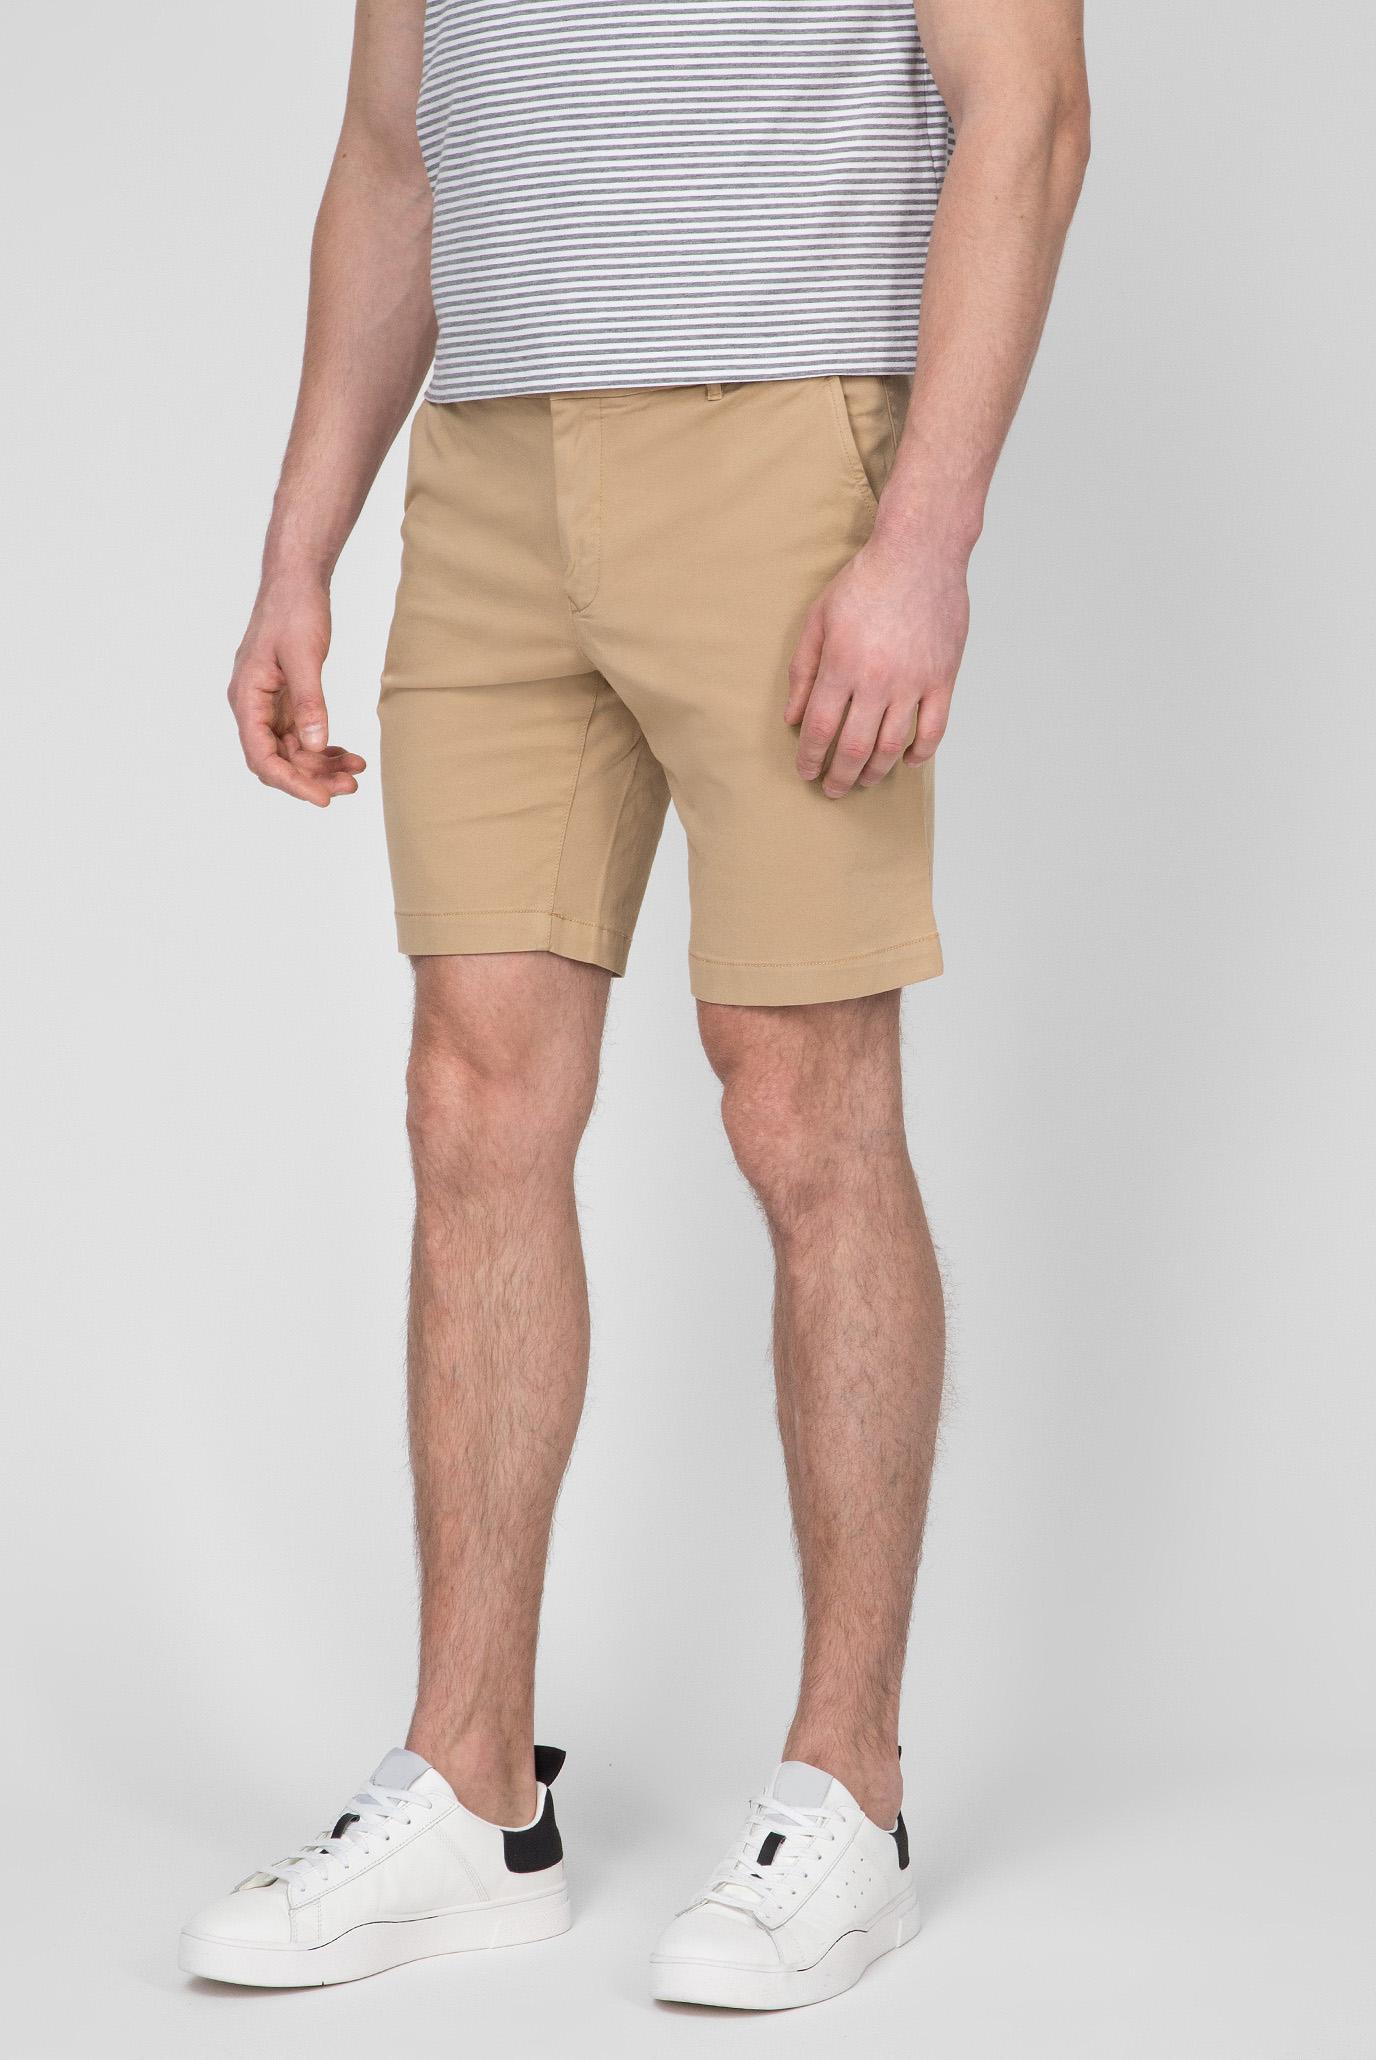 Купить Мужские бежевые шорты Calvin Klein Calvin Klein K10K104188 – Киев, Украина. Цены в интернет магазине MD Fashion